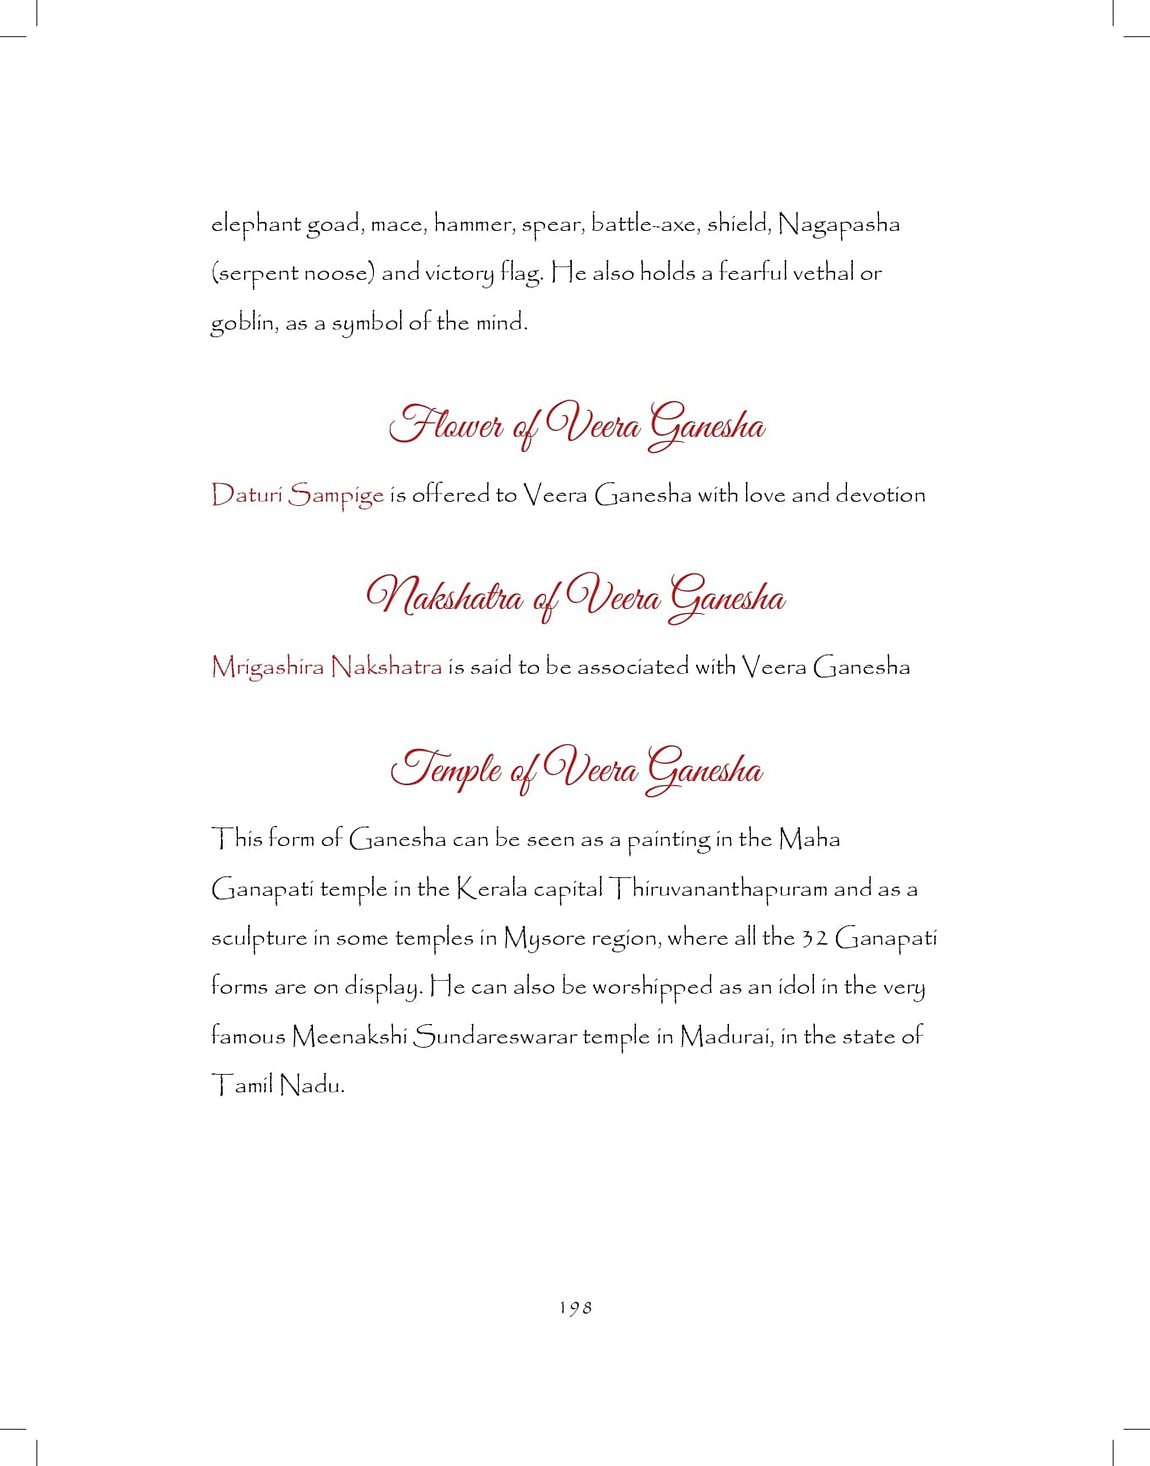 Ganesh-print_pages-to-jpg-0198.jpg